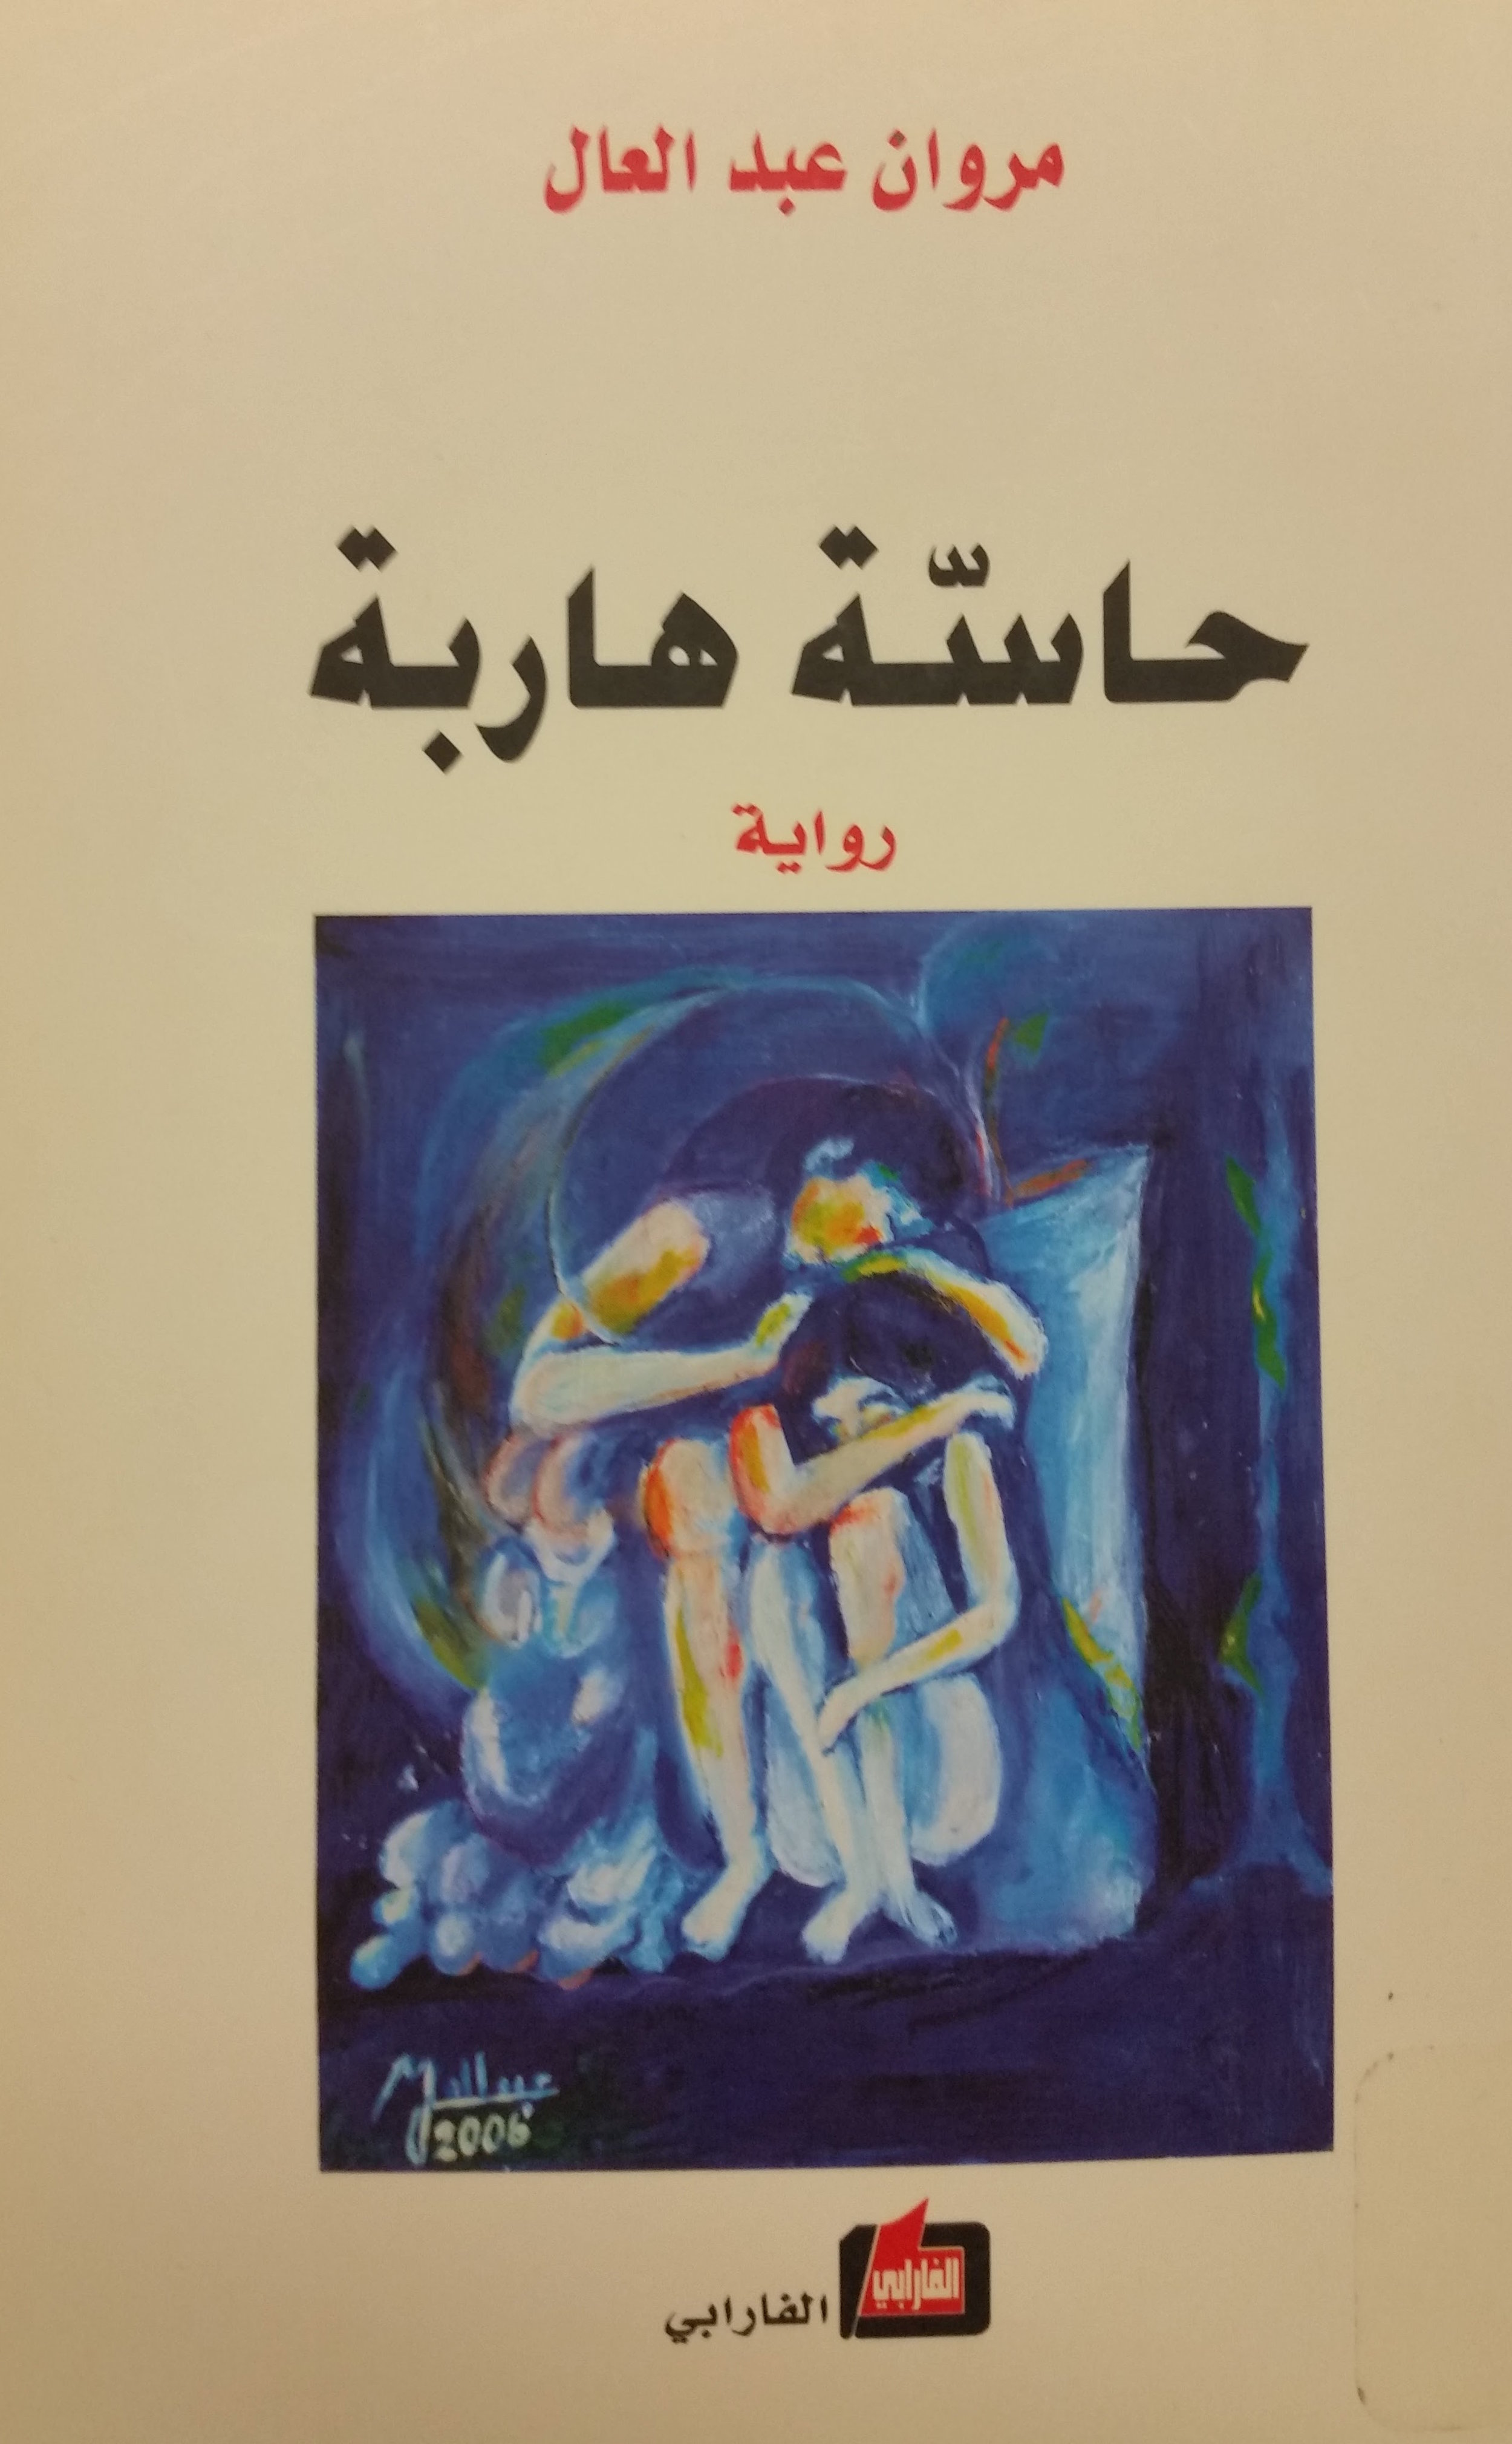 Marwān ʿAbd al-ʿĀl (Bayrūt : Dār al-Fārābī, 2008)